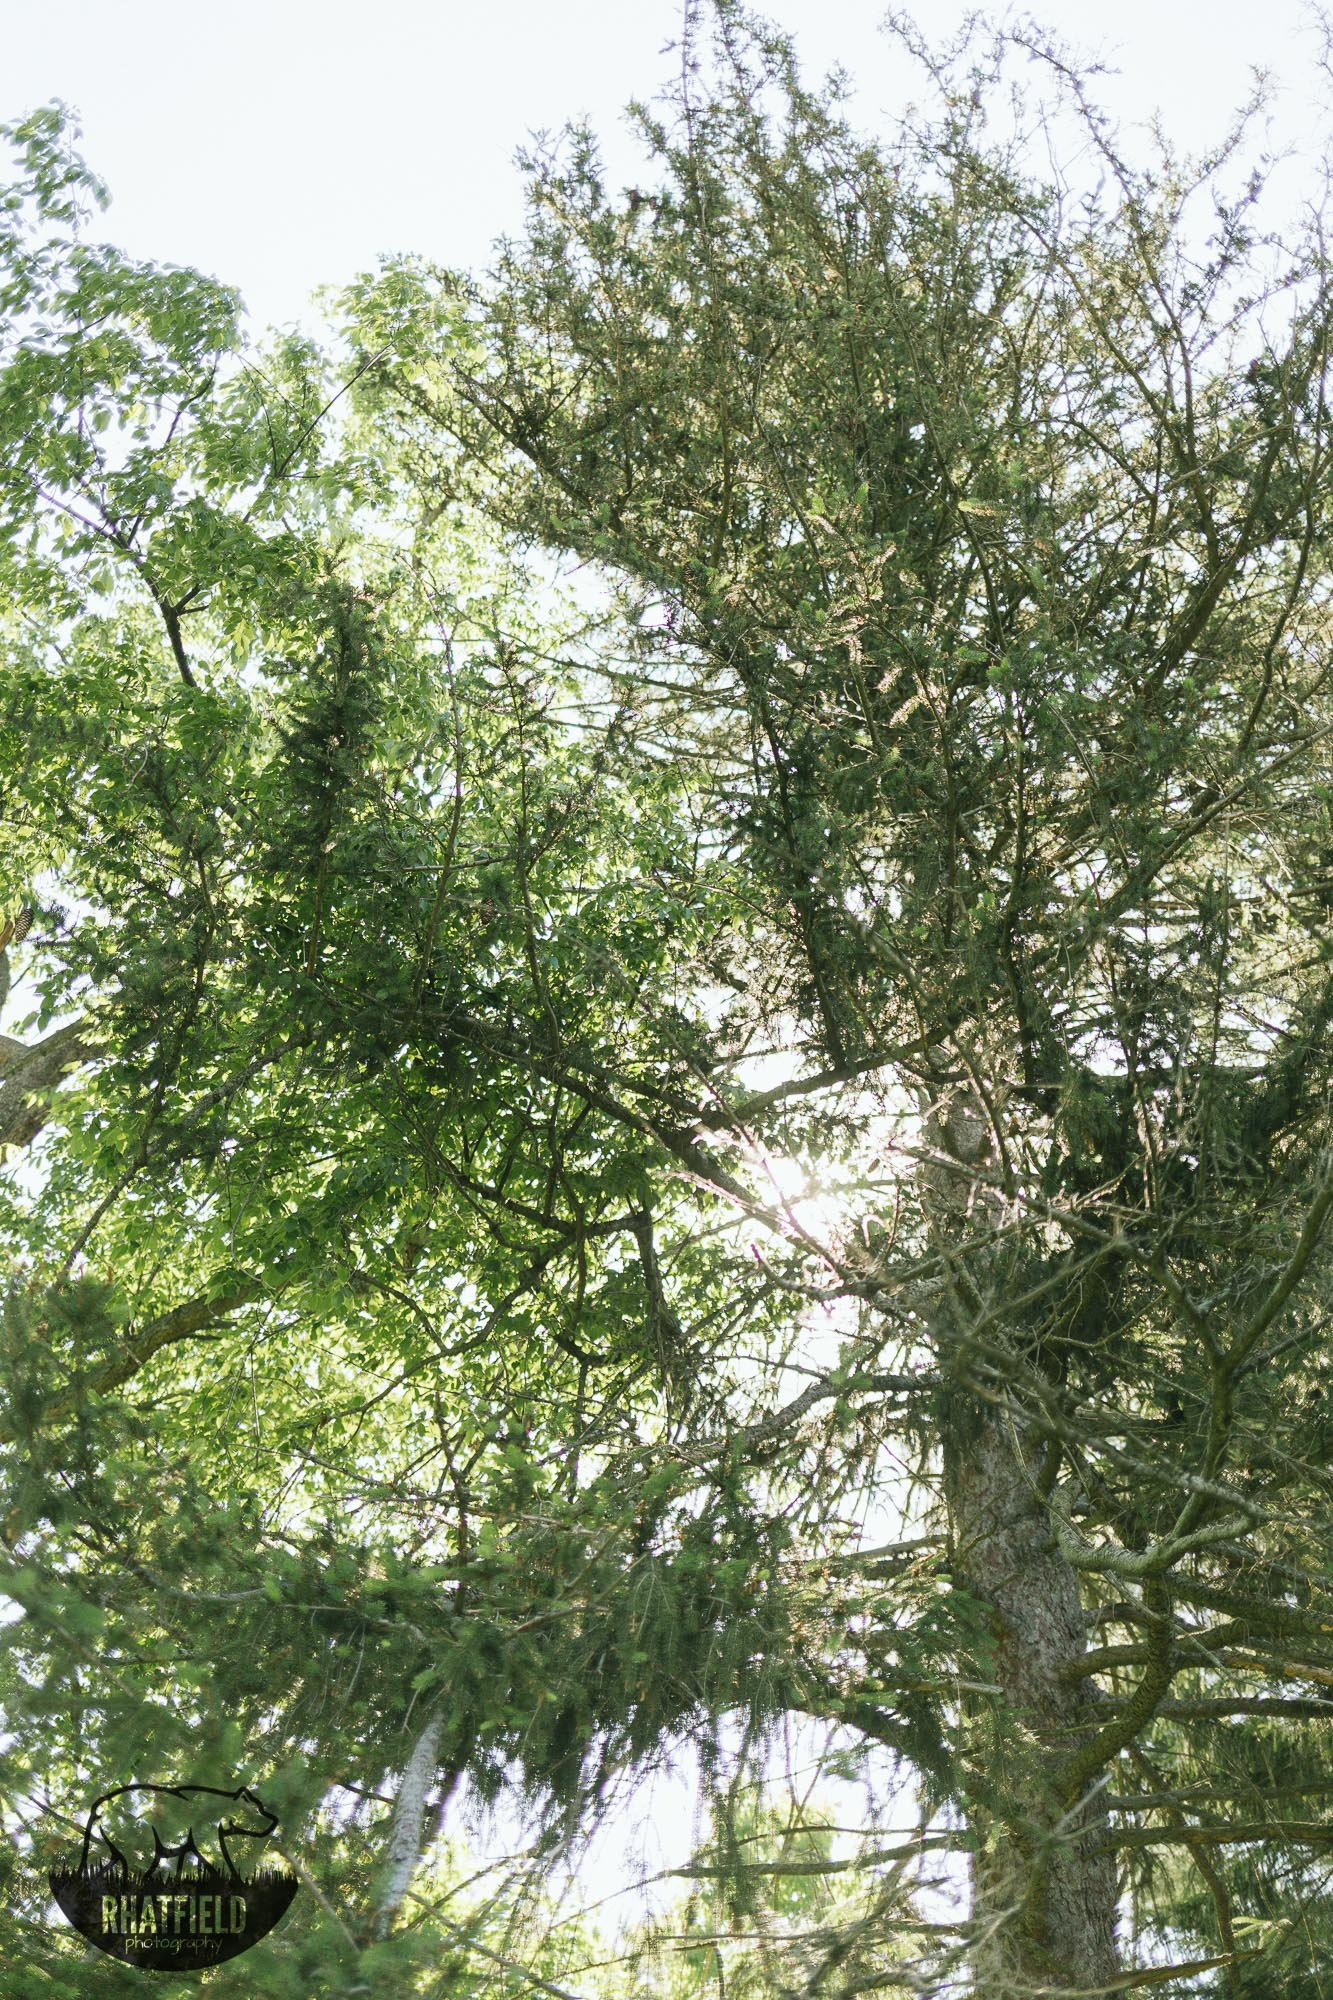 camp-tree-jameson-indianapolis